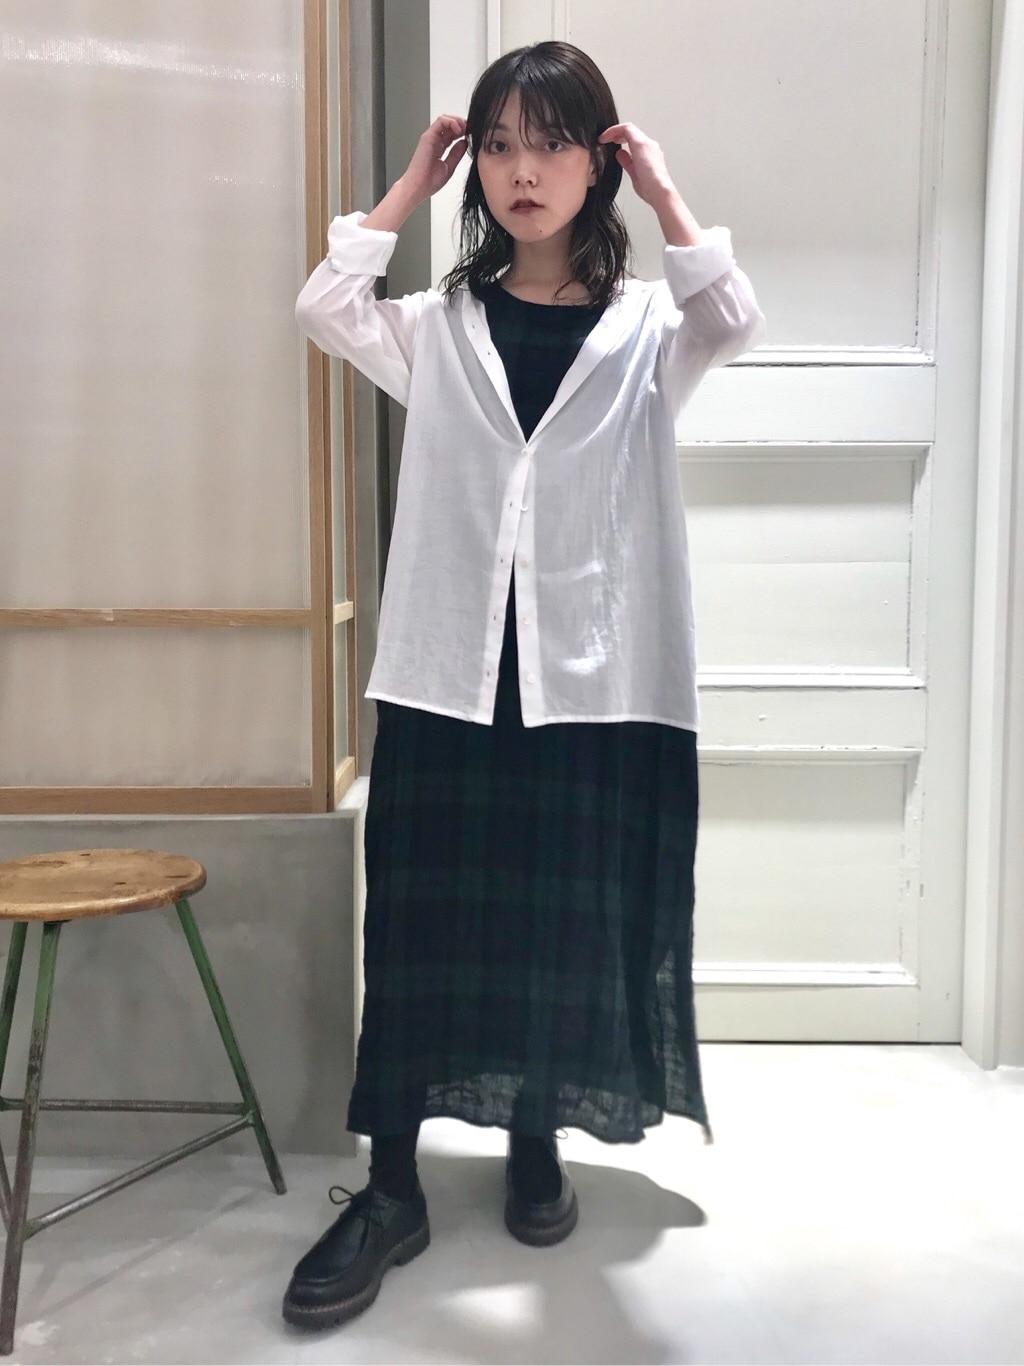 bulle de savon 渋谷スクランブルスクエア 身長:153cm 2020.08.18